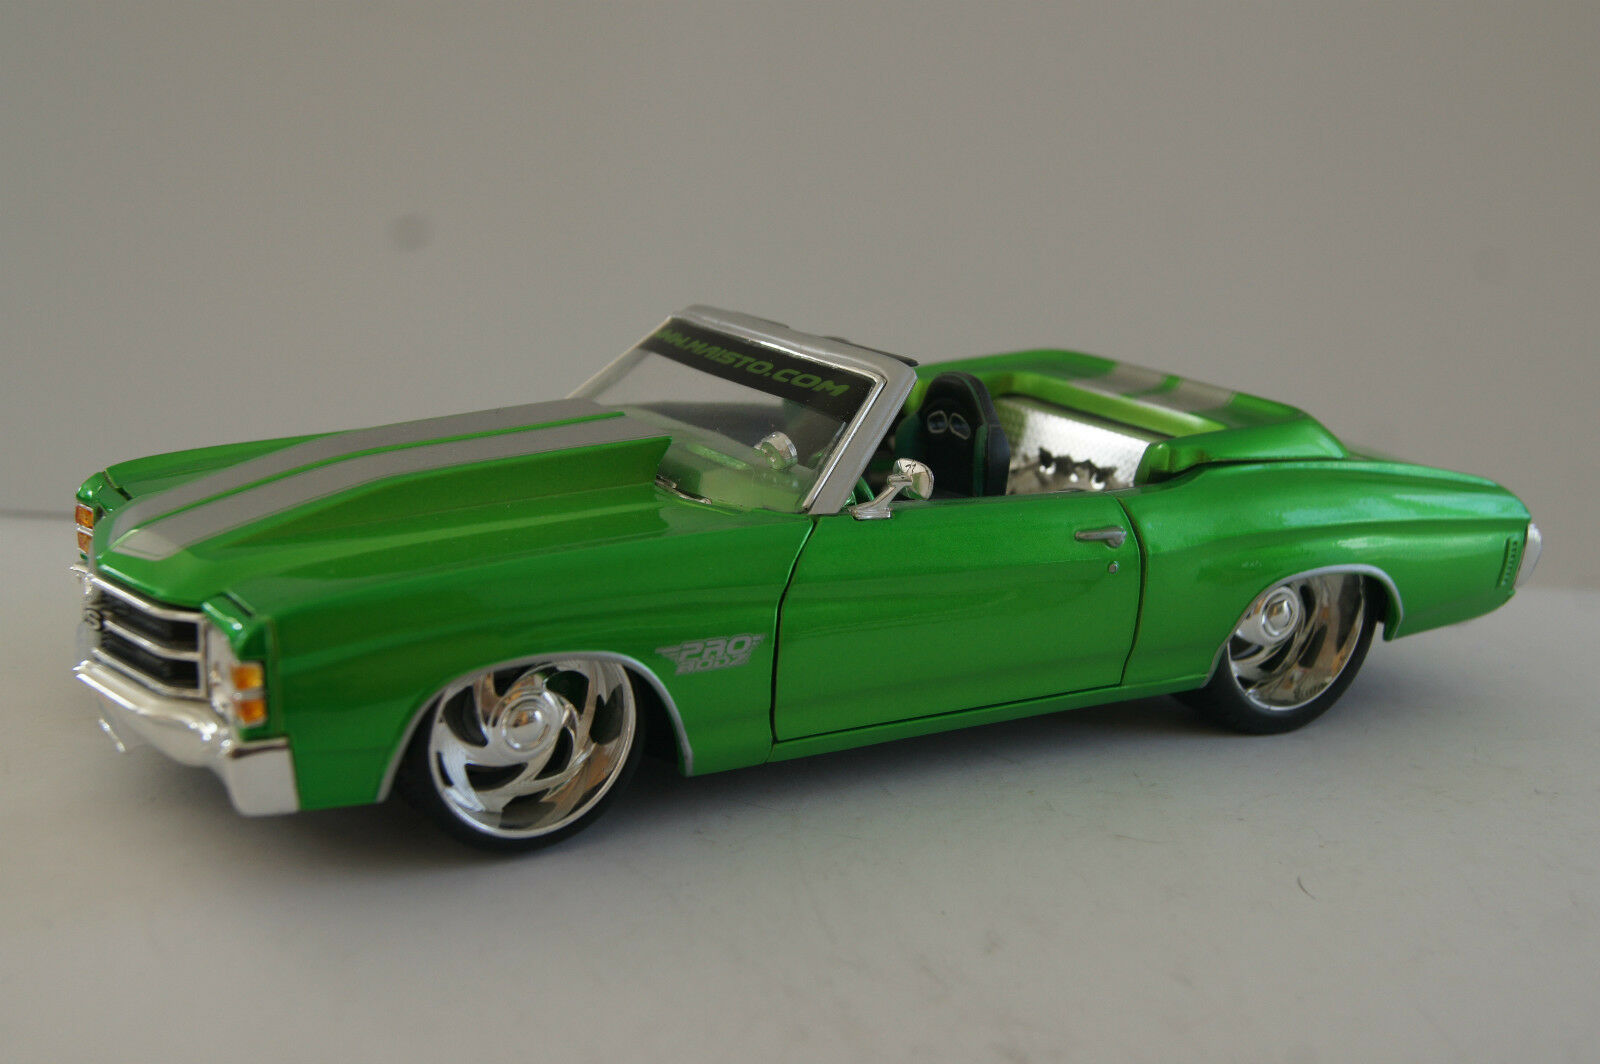 MAISTO voiture miniature 1 18 CHEVROLET CHEVELLE 1971 par podz